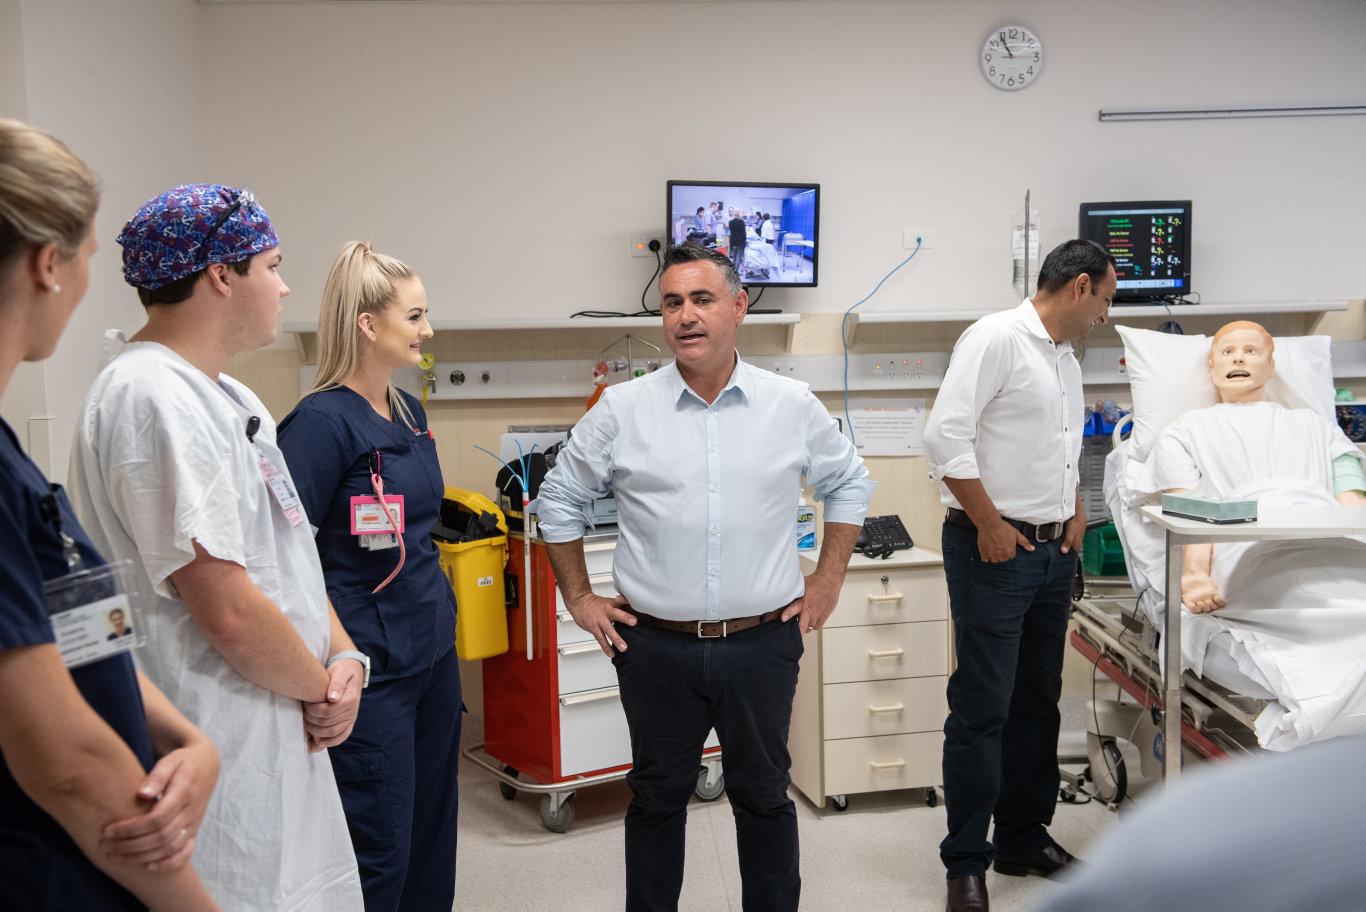 Deputy Premier John Barilaro and Nationals candidate for Coffs Harbour Gurmesh Singh at the Coffs Harbour Base Hospital.